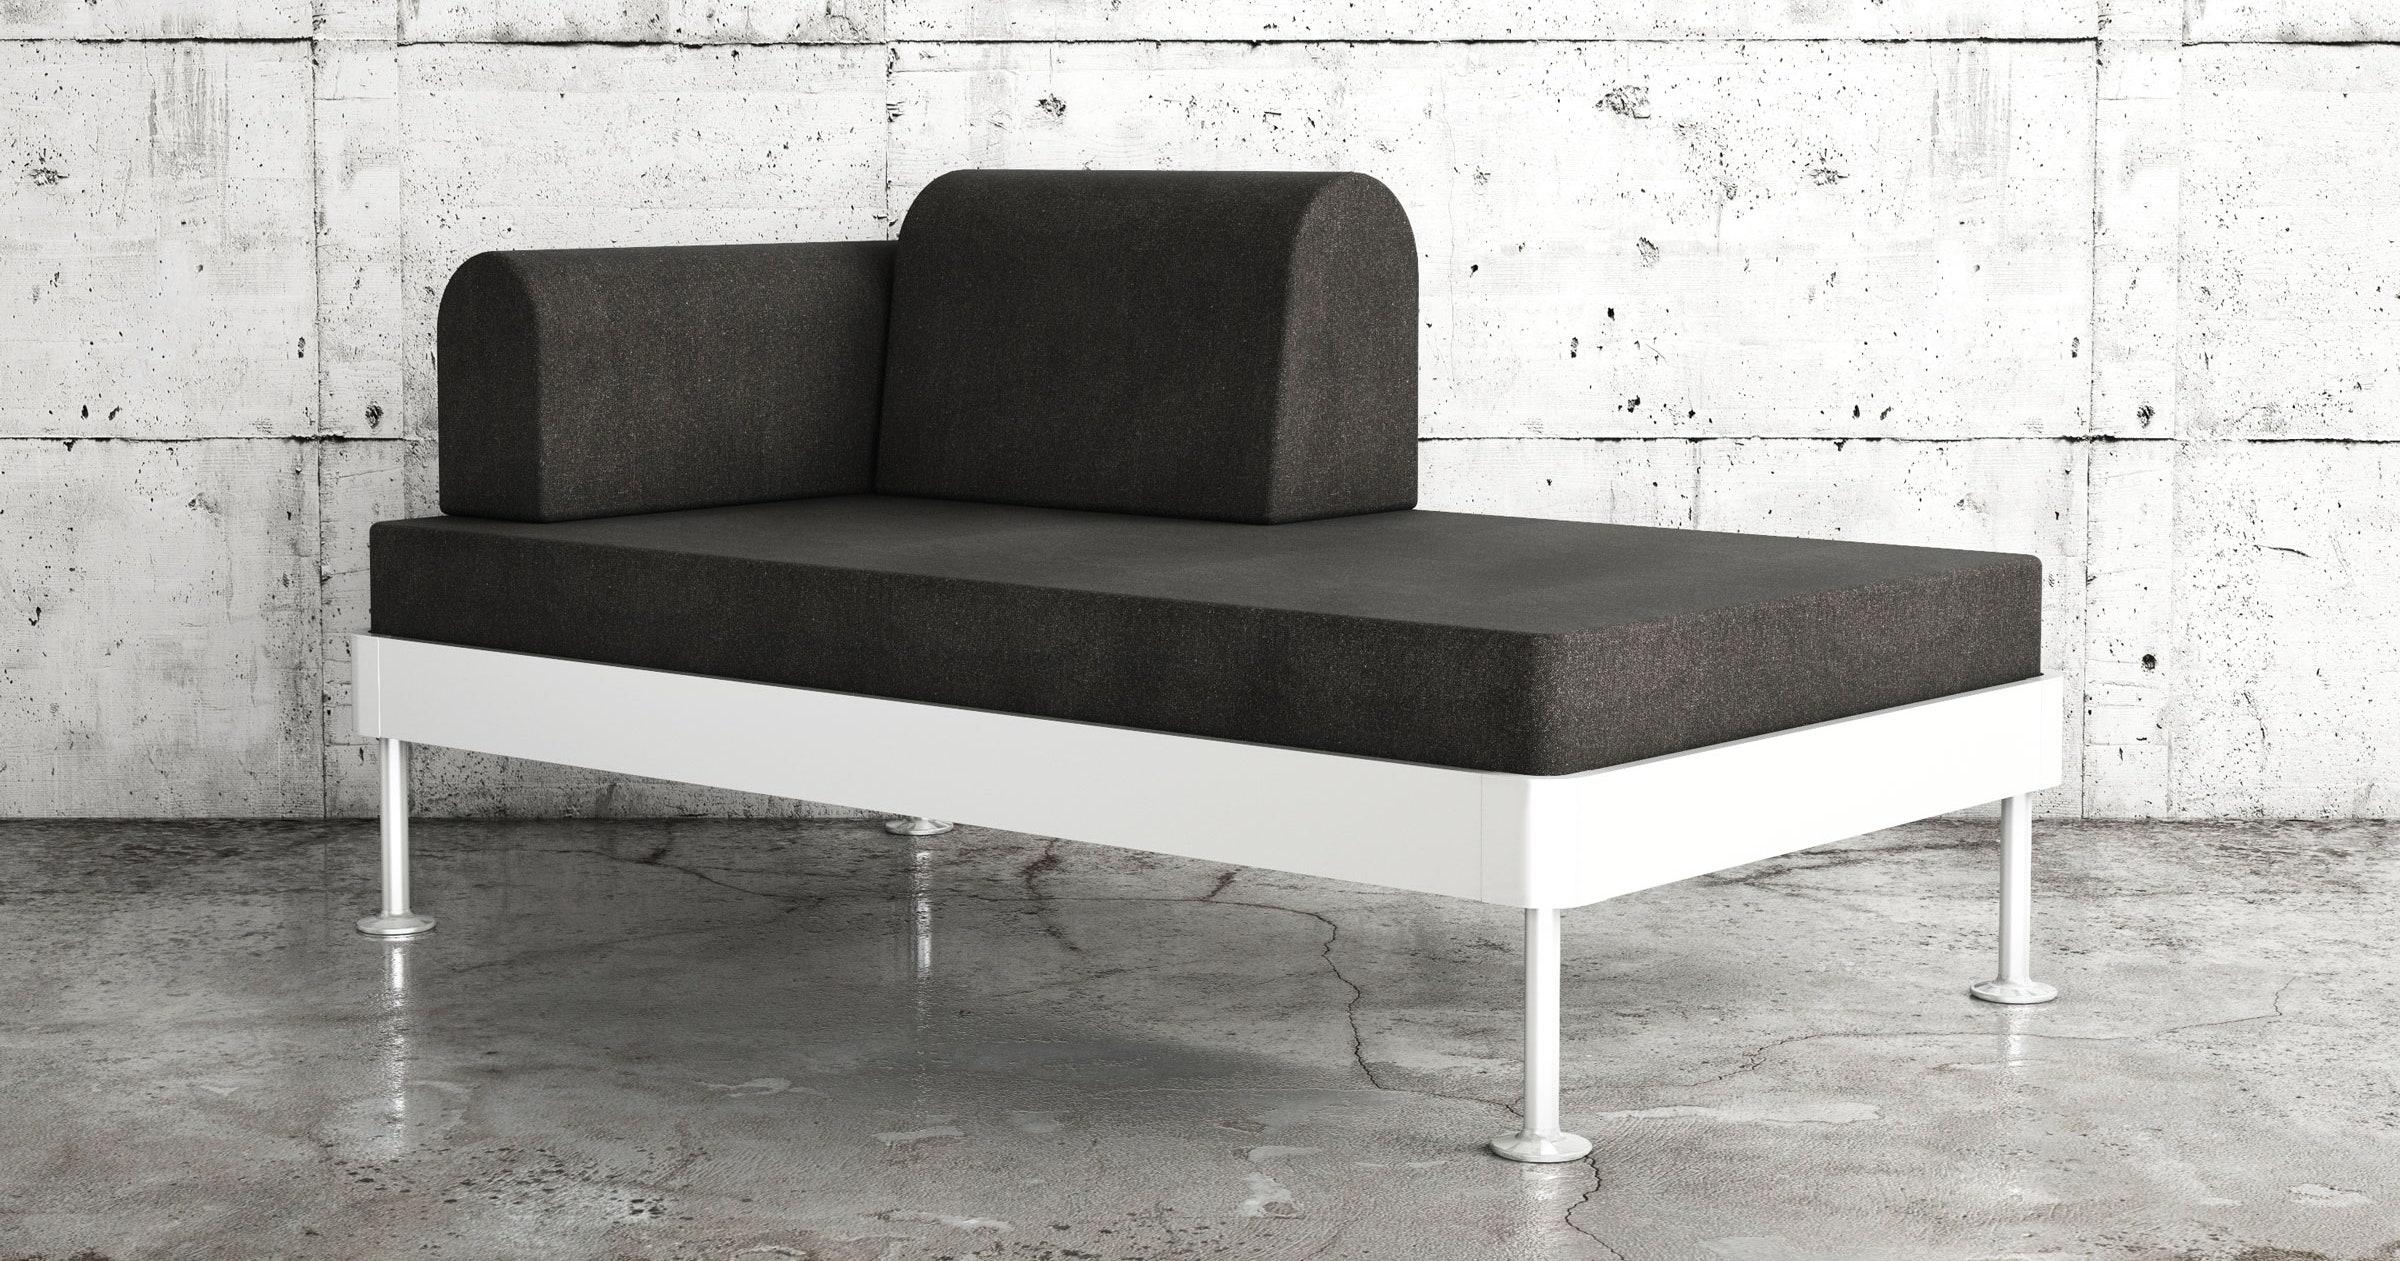 Ikea'S Delaktig Bed Is The Future Of Ikea Hacking, Says ... pour Ikea